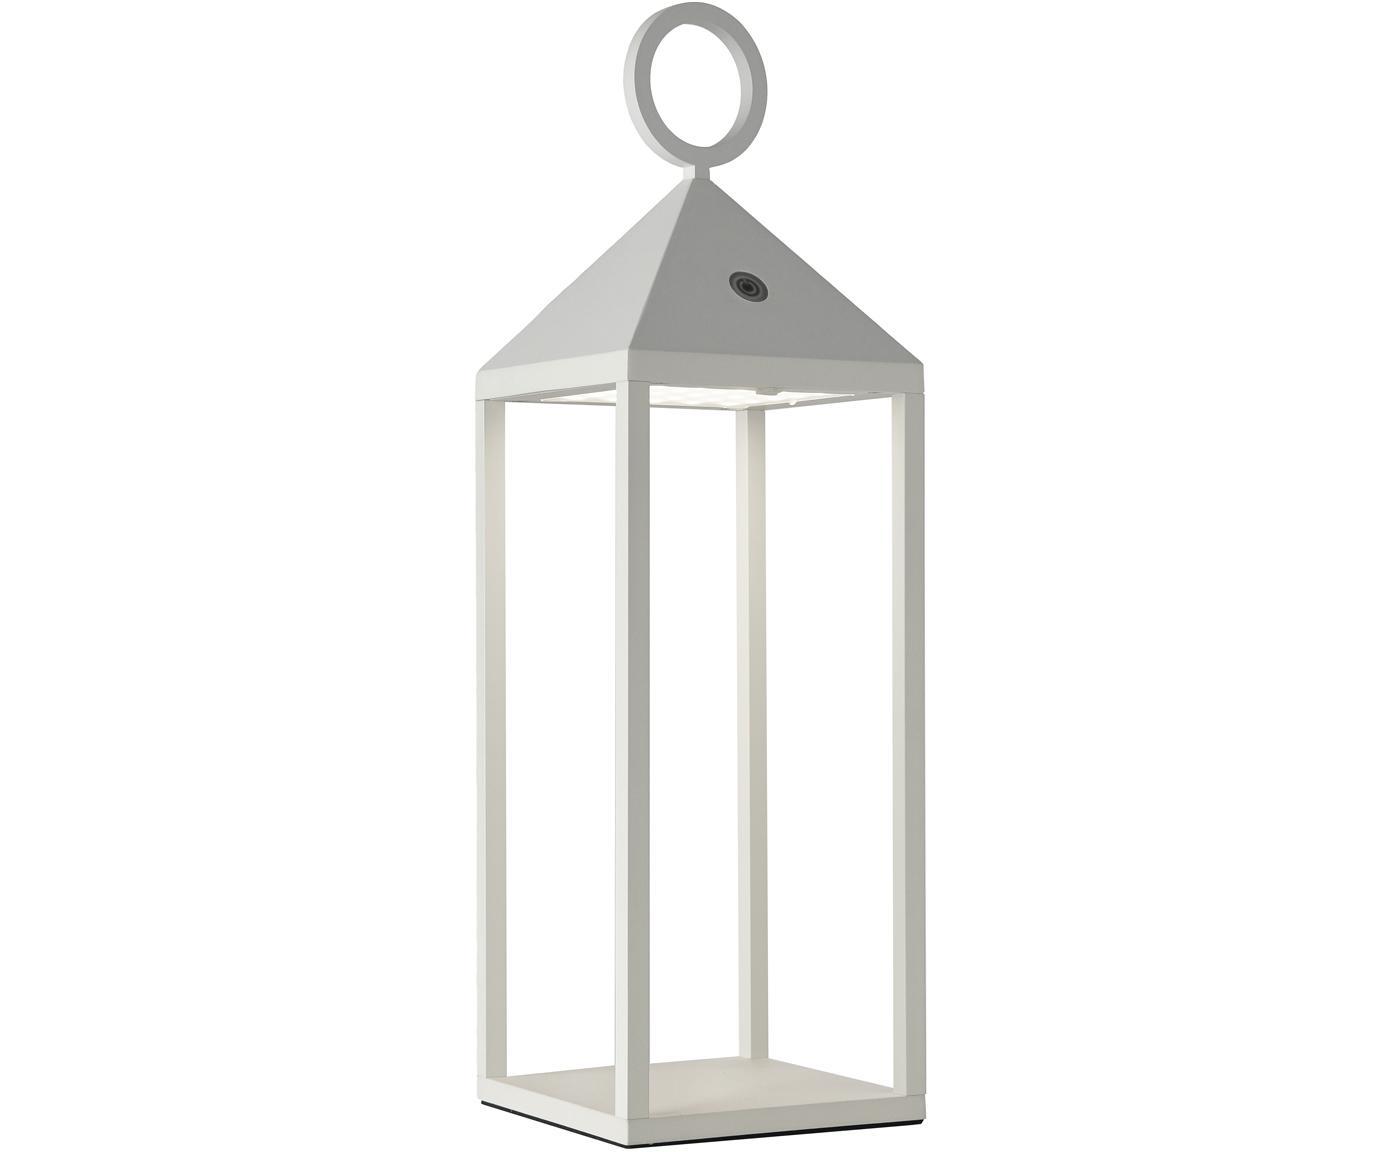 Lámpara LED de exterior Cargo, portátil, Aluminio, pintado, Blanco, An 14 x Al 47 cm